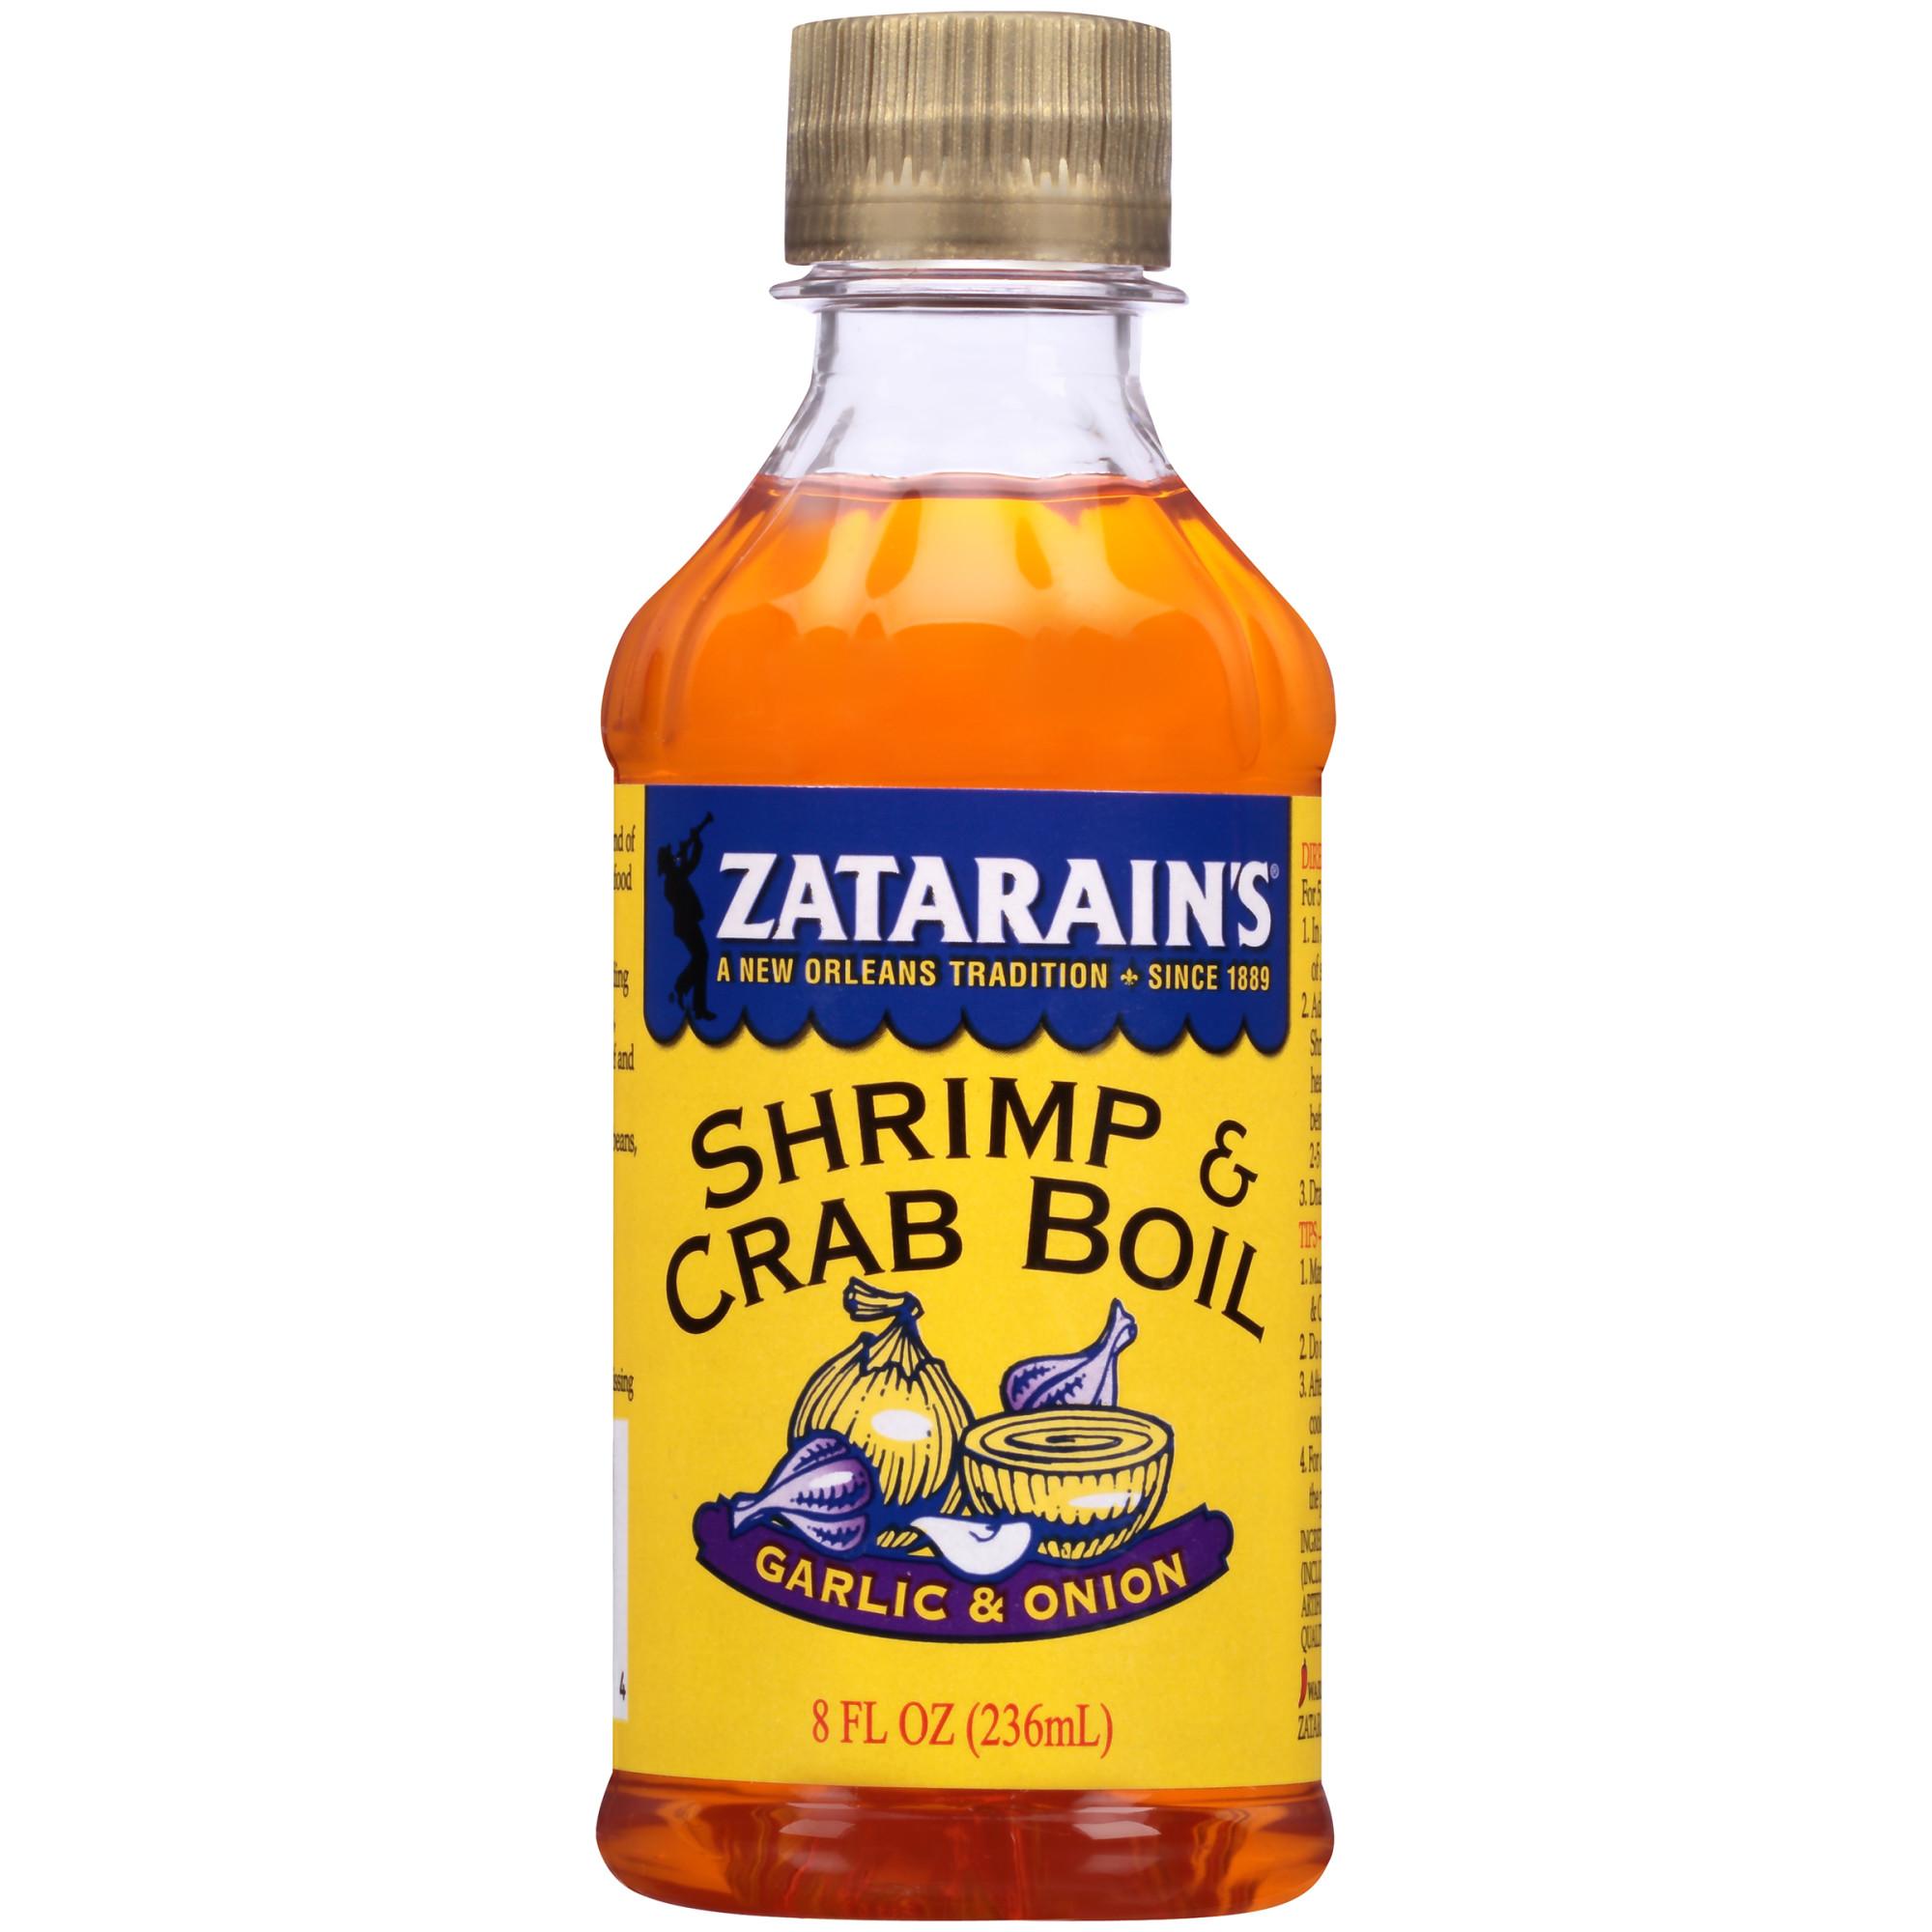 (3 Pack) Zatarain's New Orleans Style Liquid Crab Boil With Garlic & Onion, 8 oz